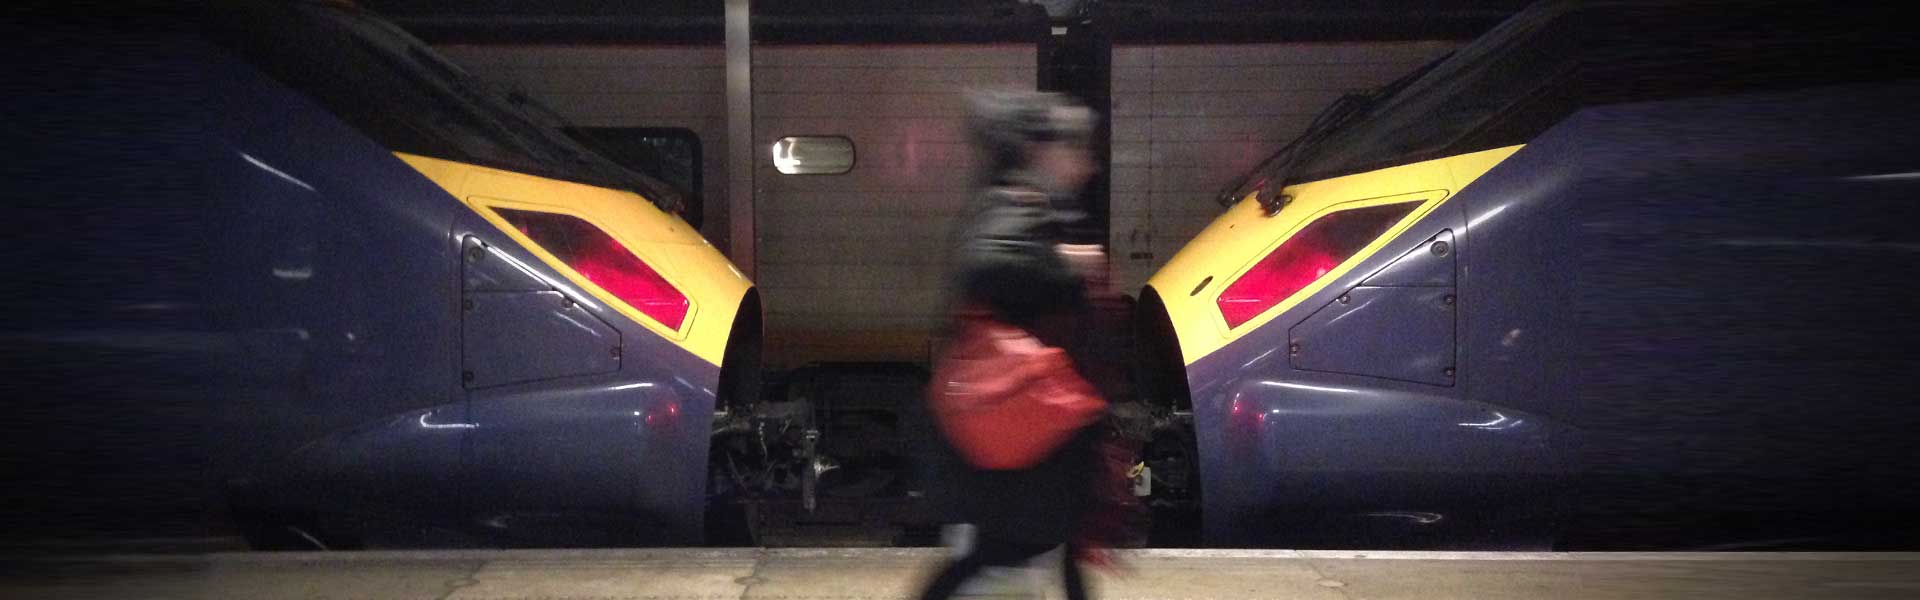 Southeastern High Speed Javelin trains at St Pancras